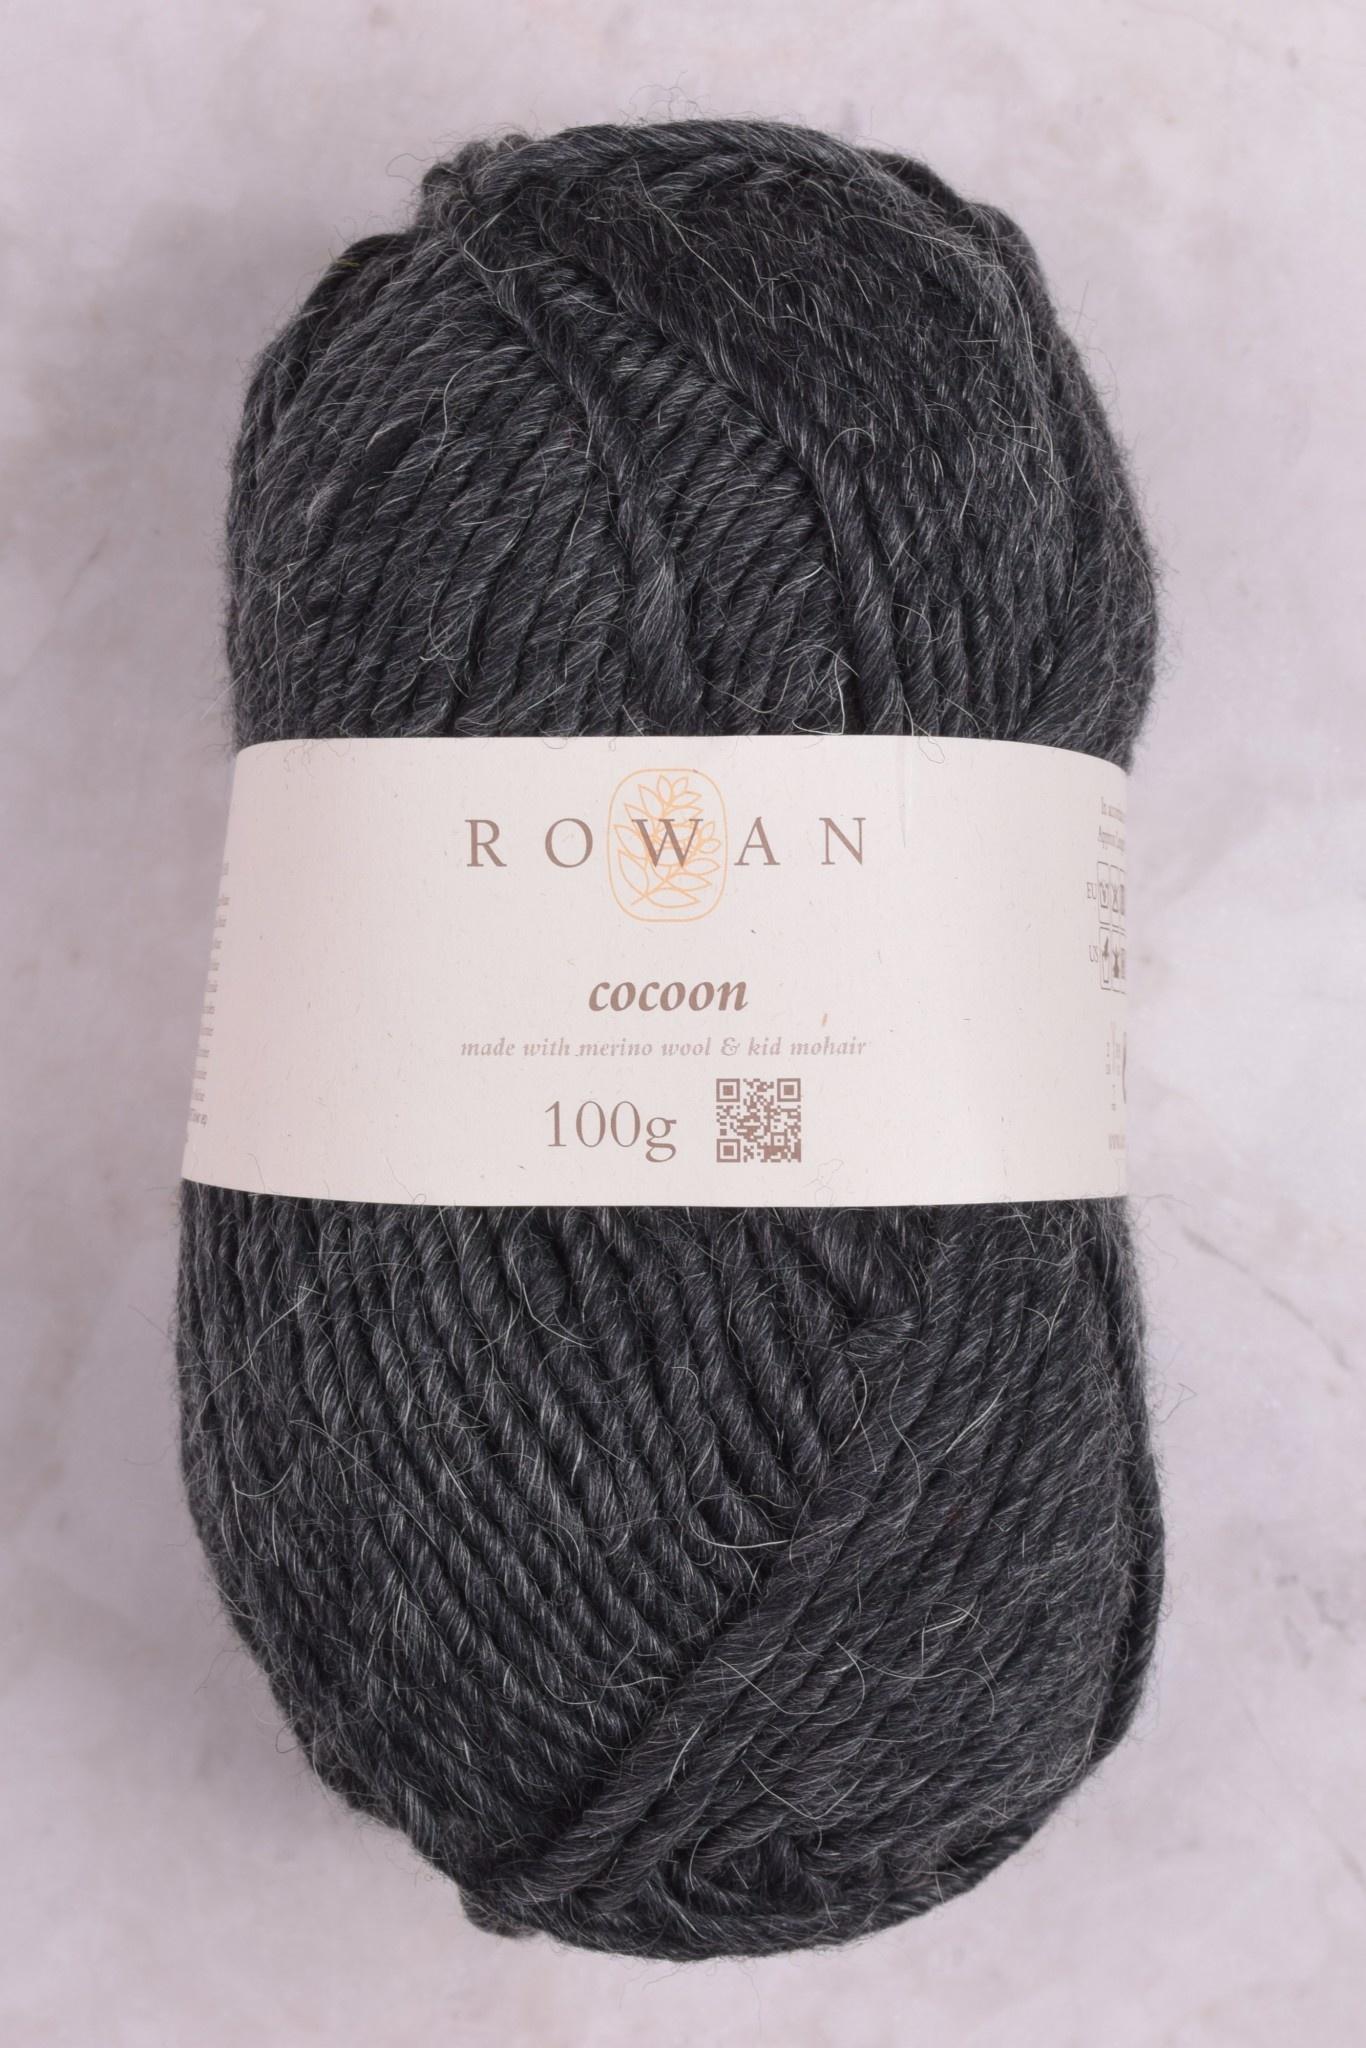 Image of Rowan Cocoon 805 Mountain